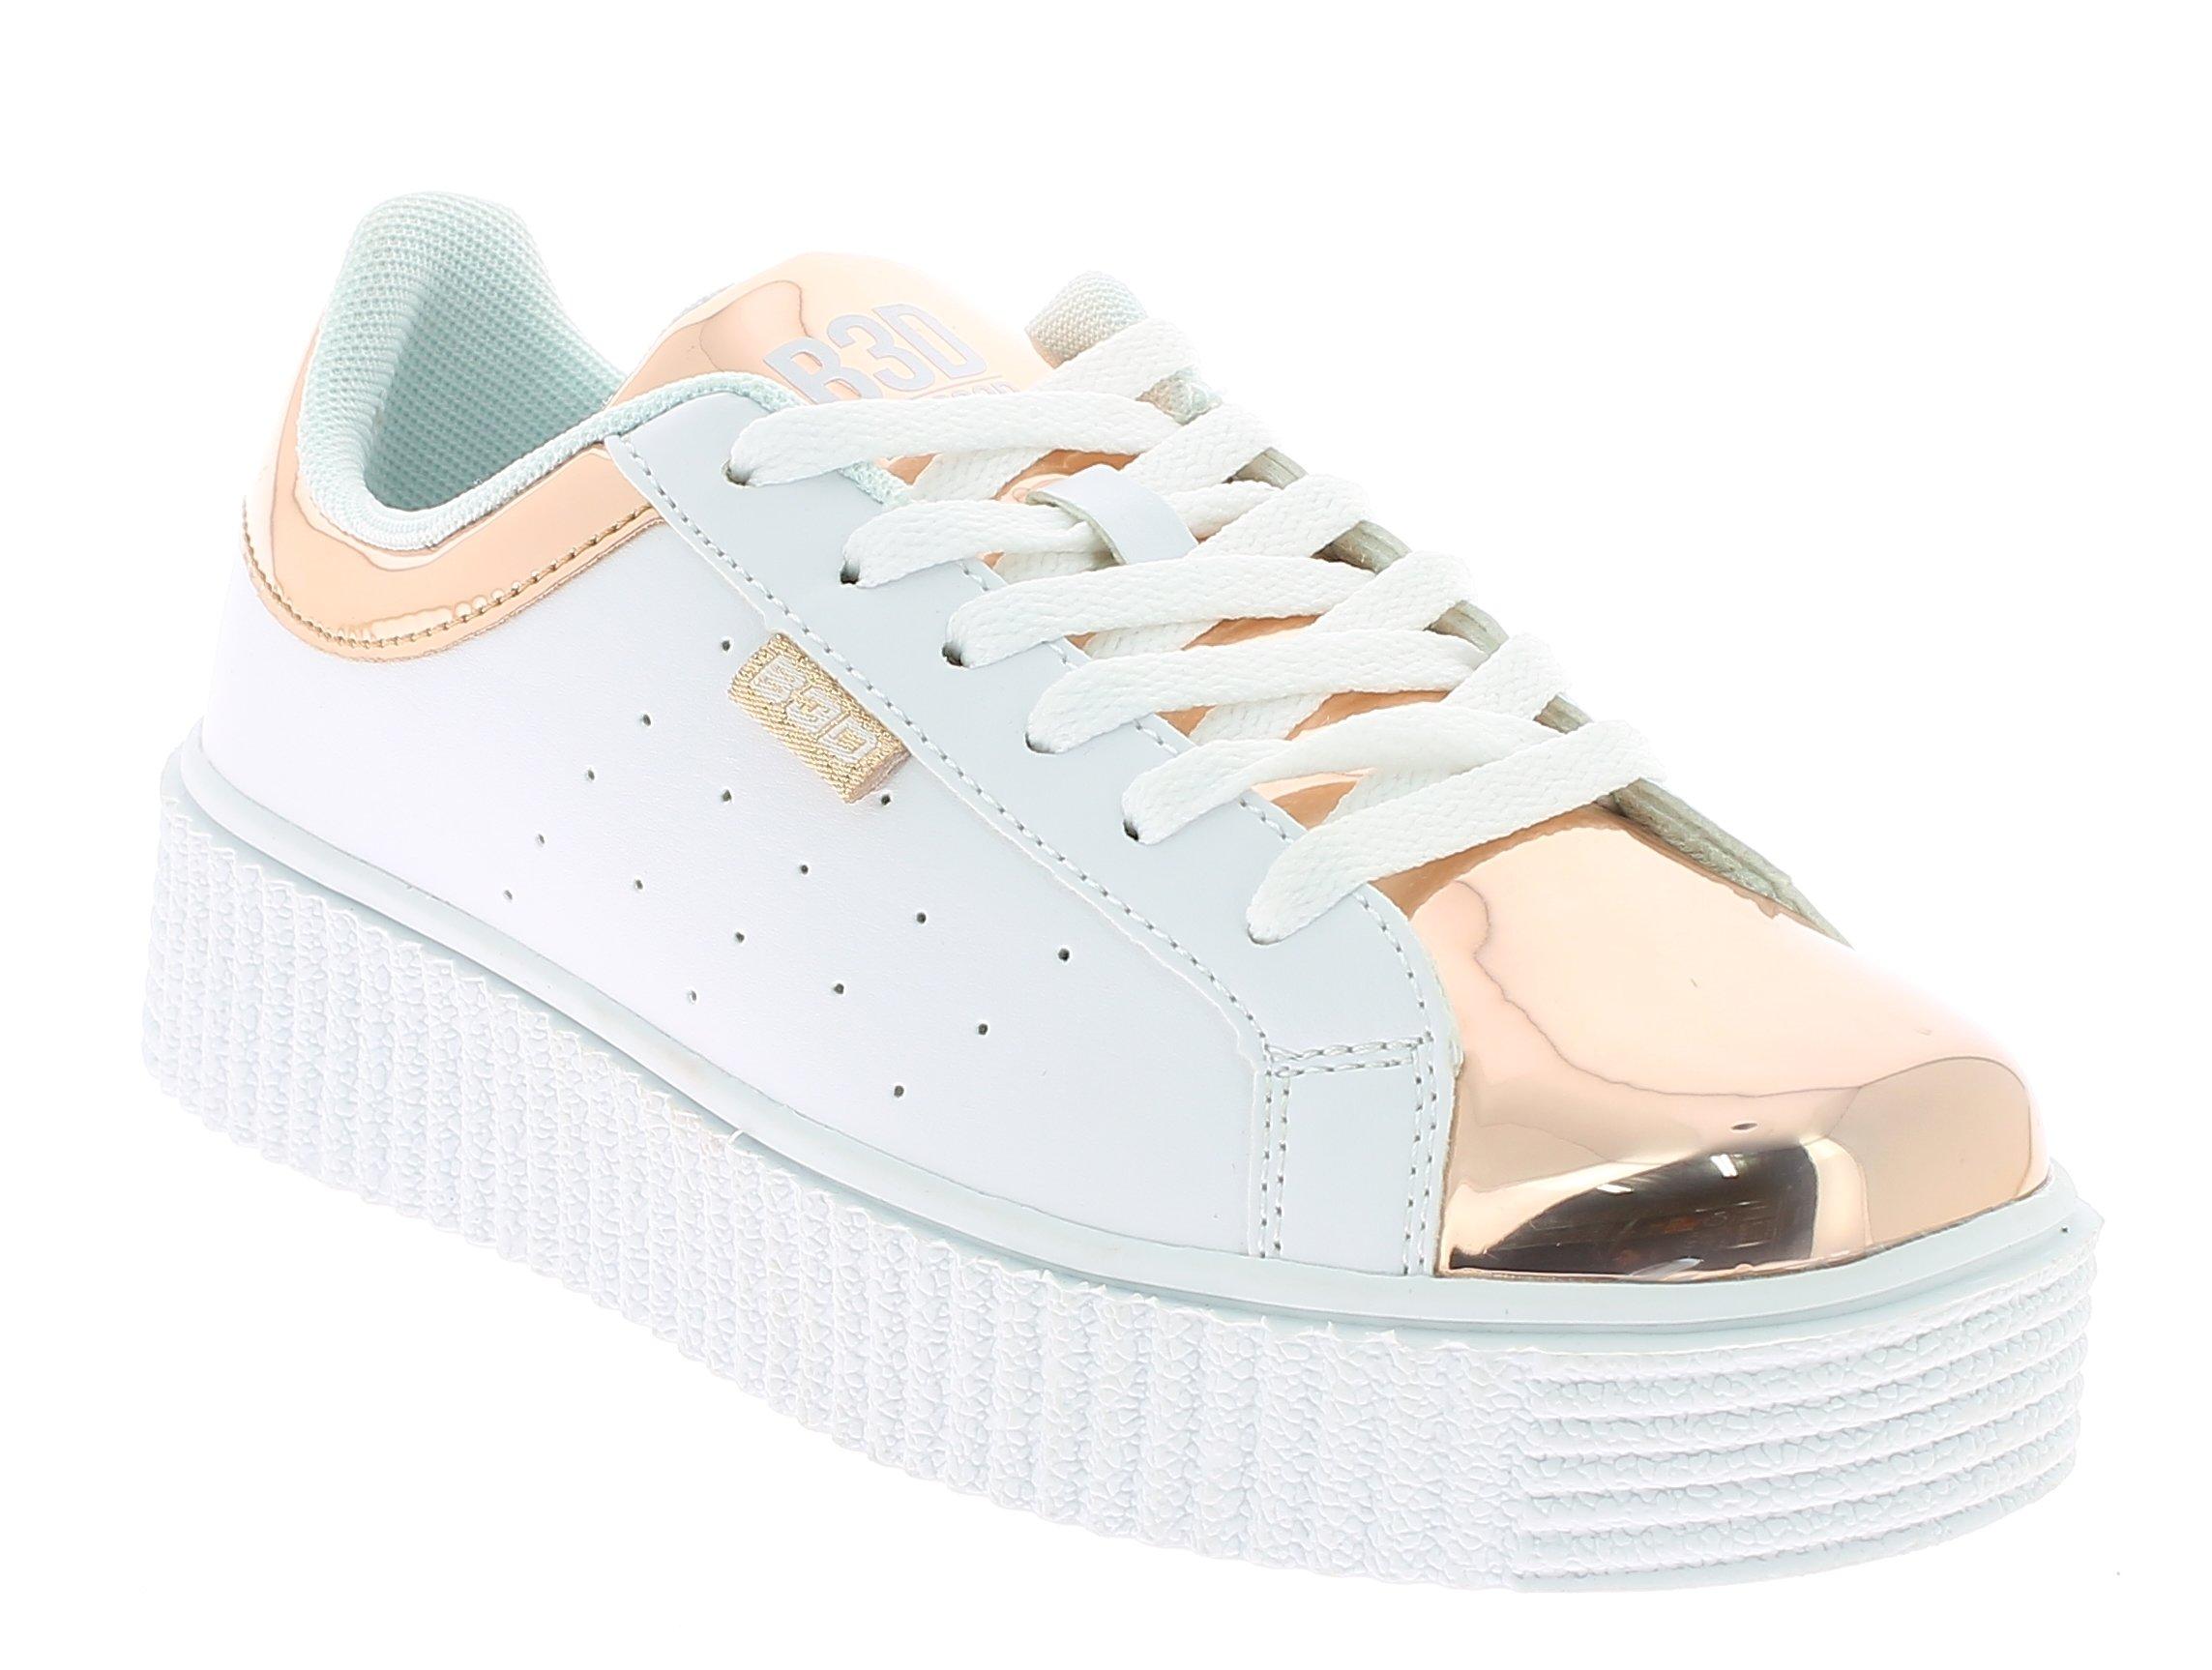 XTI Γυναικείο Casual 41271 Μπεζ - IqShoes - 41271 NUDE-beige-40/1/7/8 προϊόντα παπούτσια